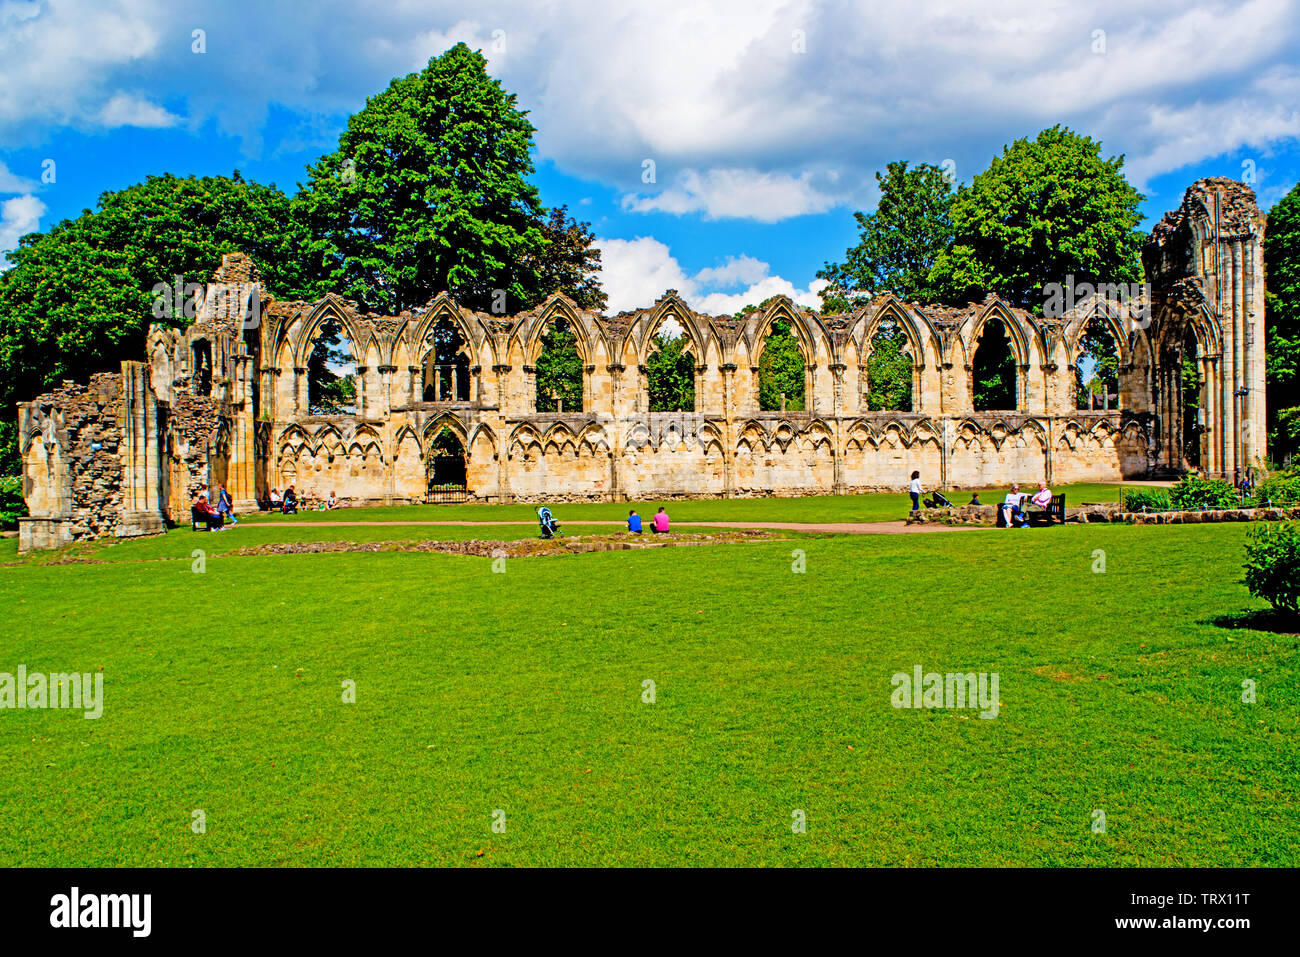 Ruins of St Marys Abbey, Museum Gardens, York, England Stock Photo